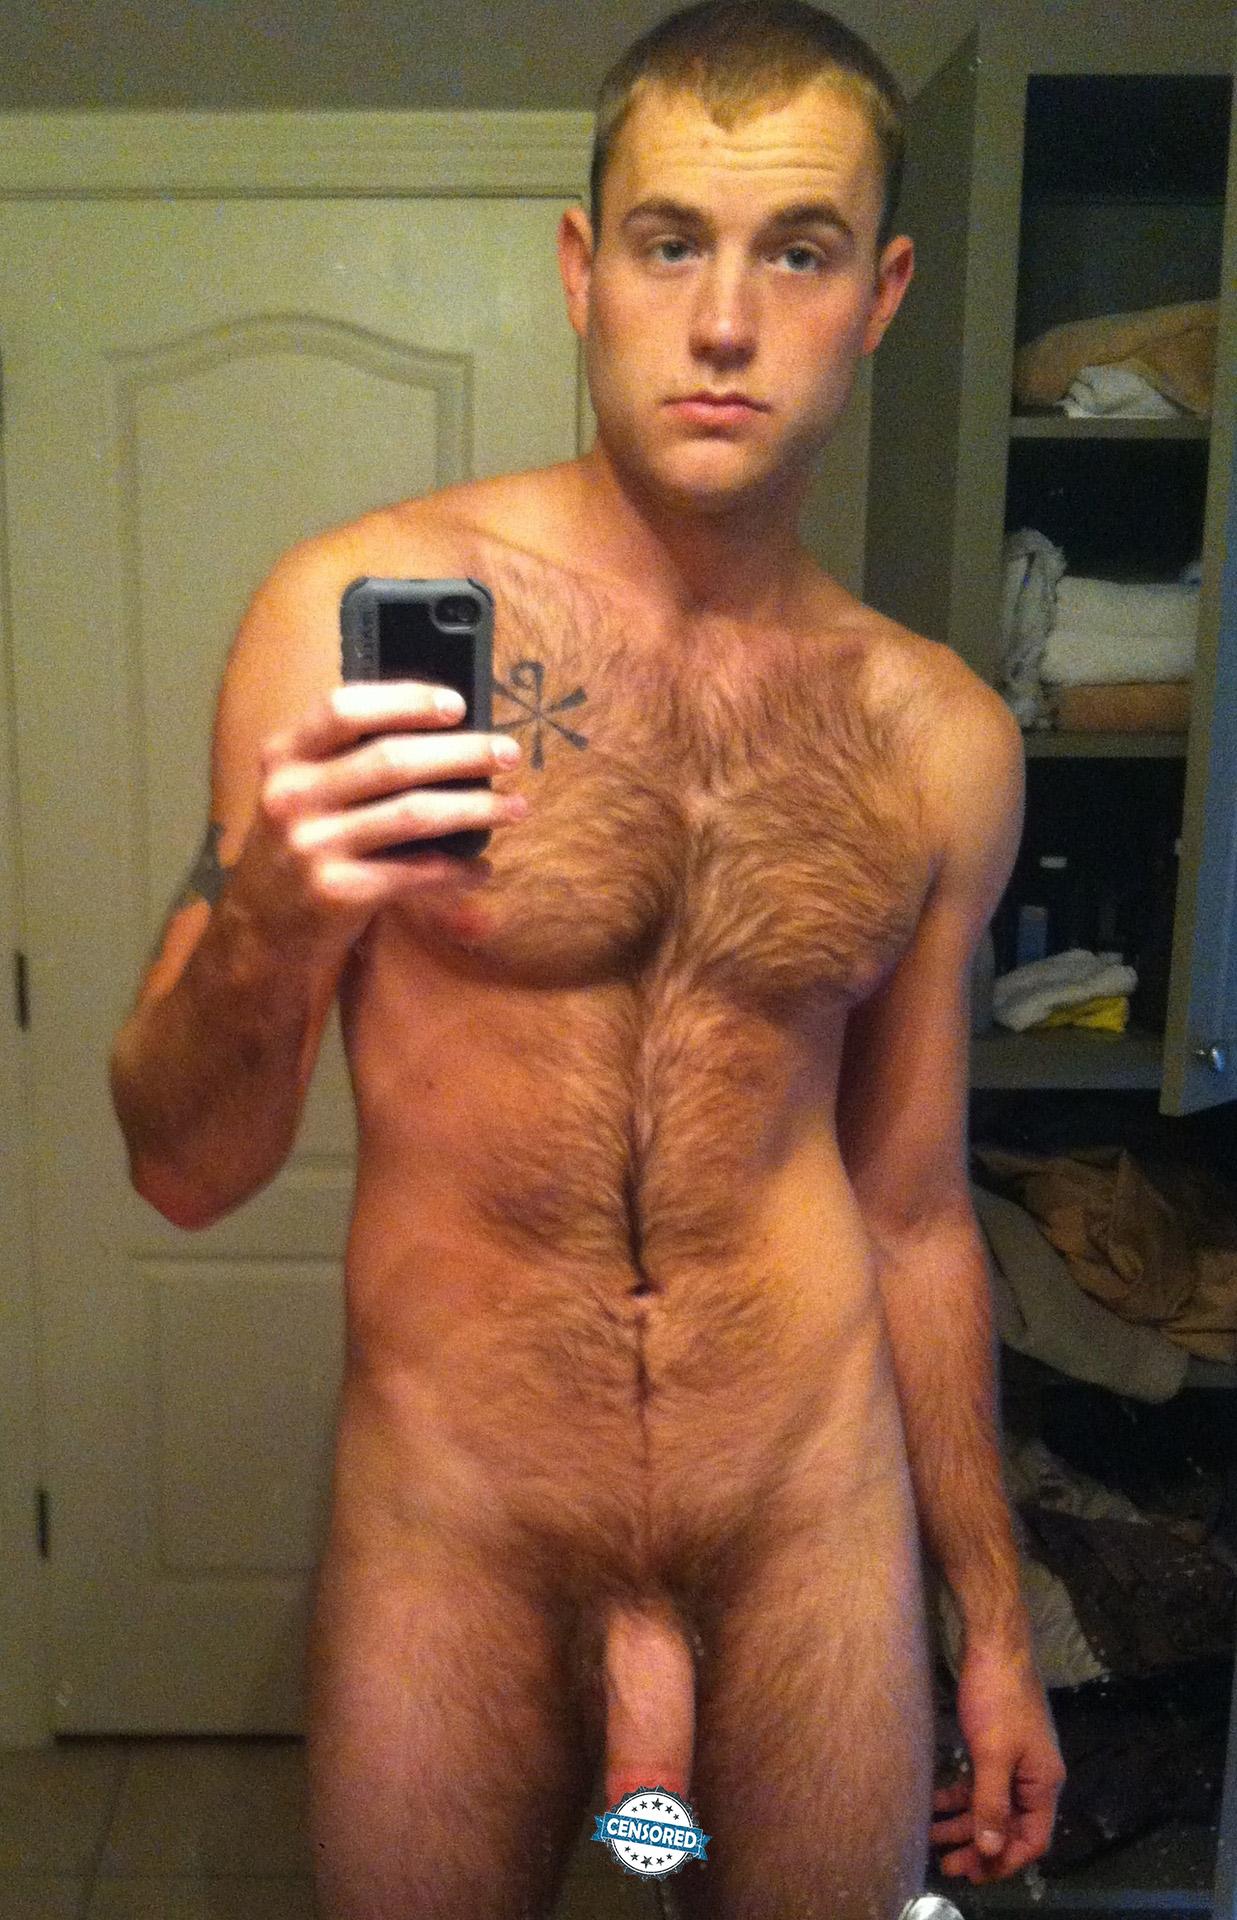 Hairy Nude Hairy Nude Guy Cock Boy: pezporn.com/hairy-nude/199226.html